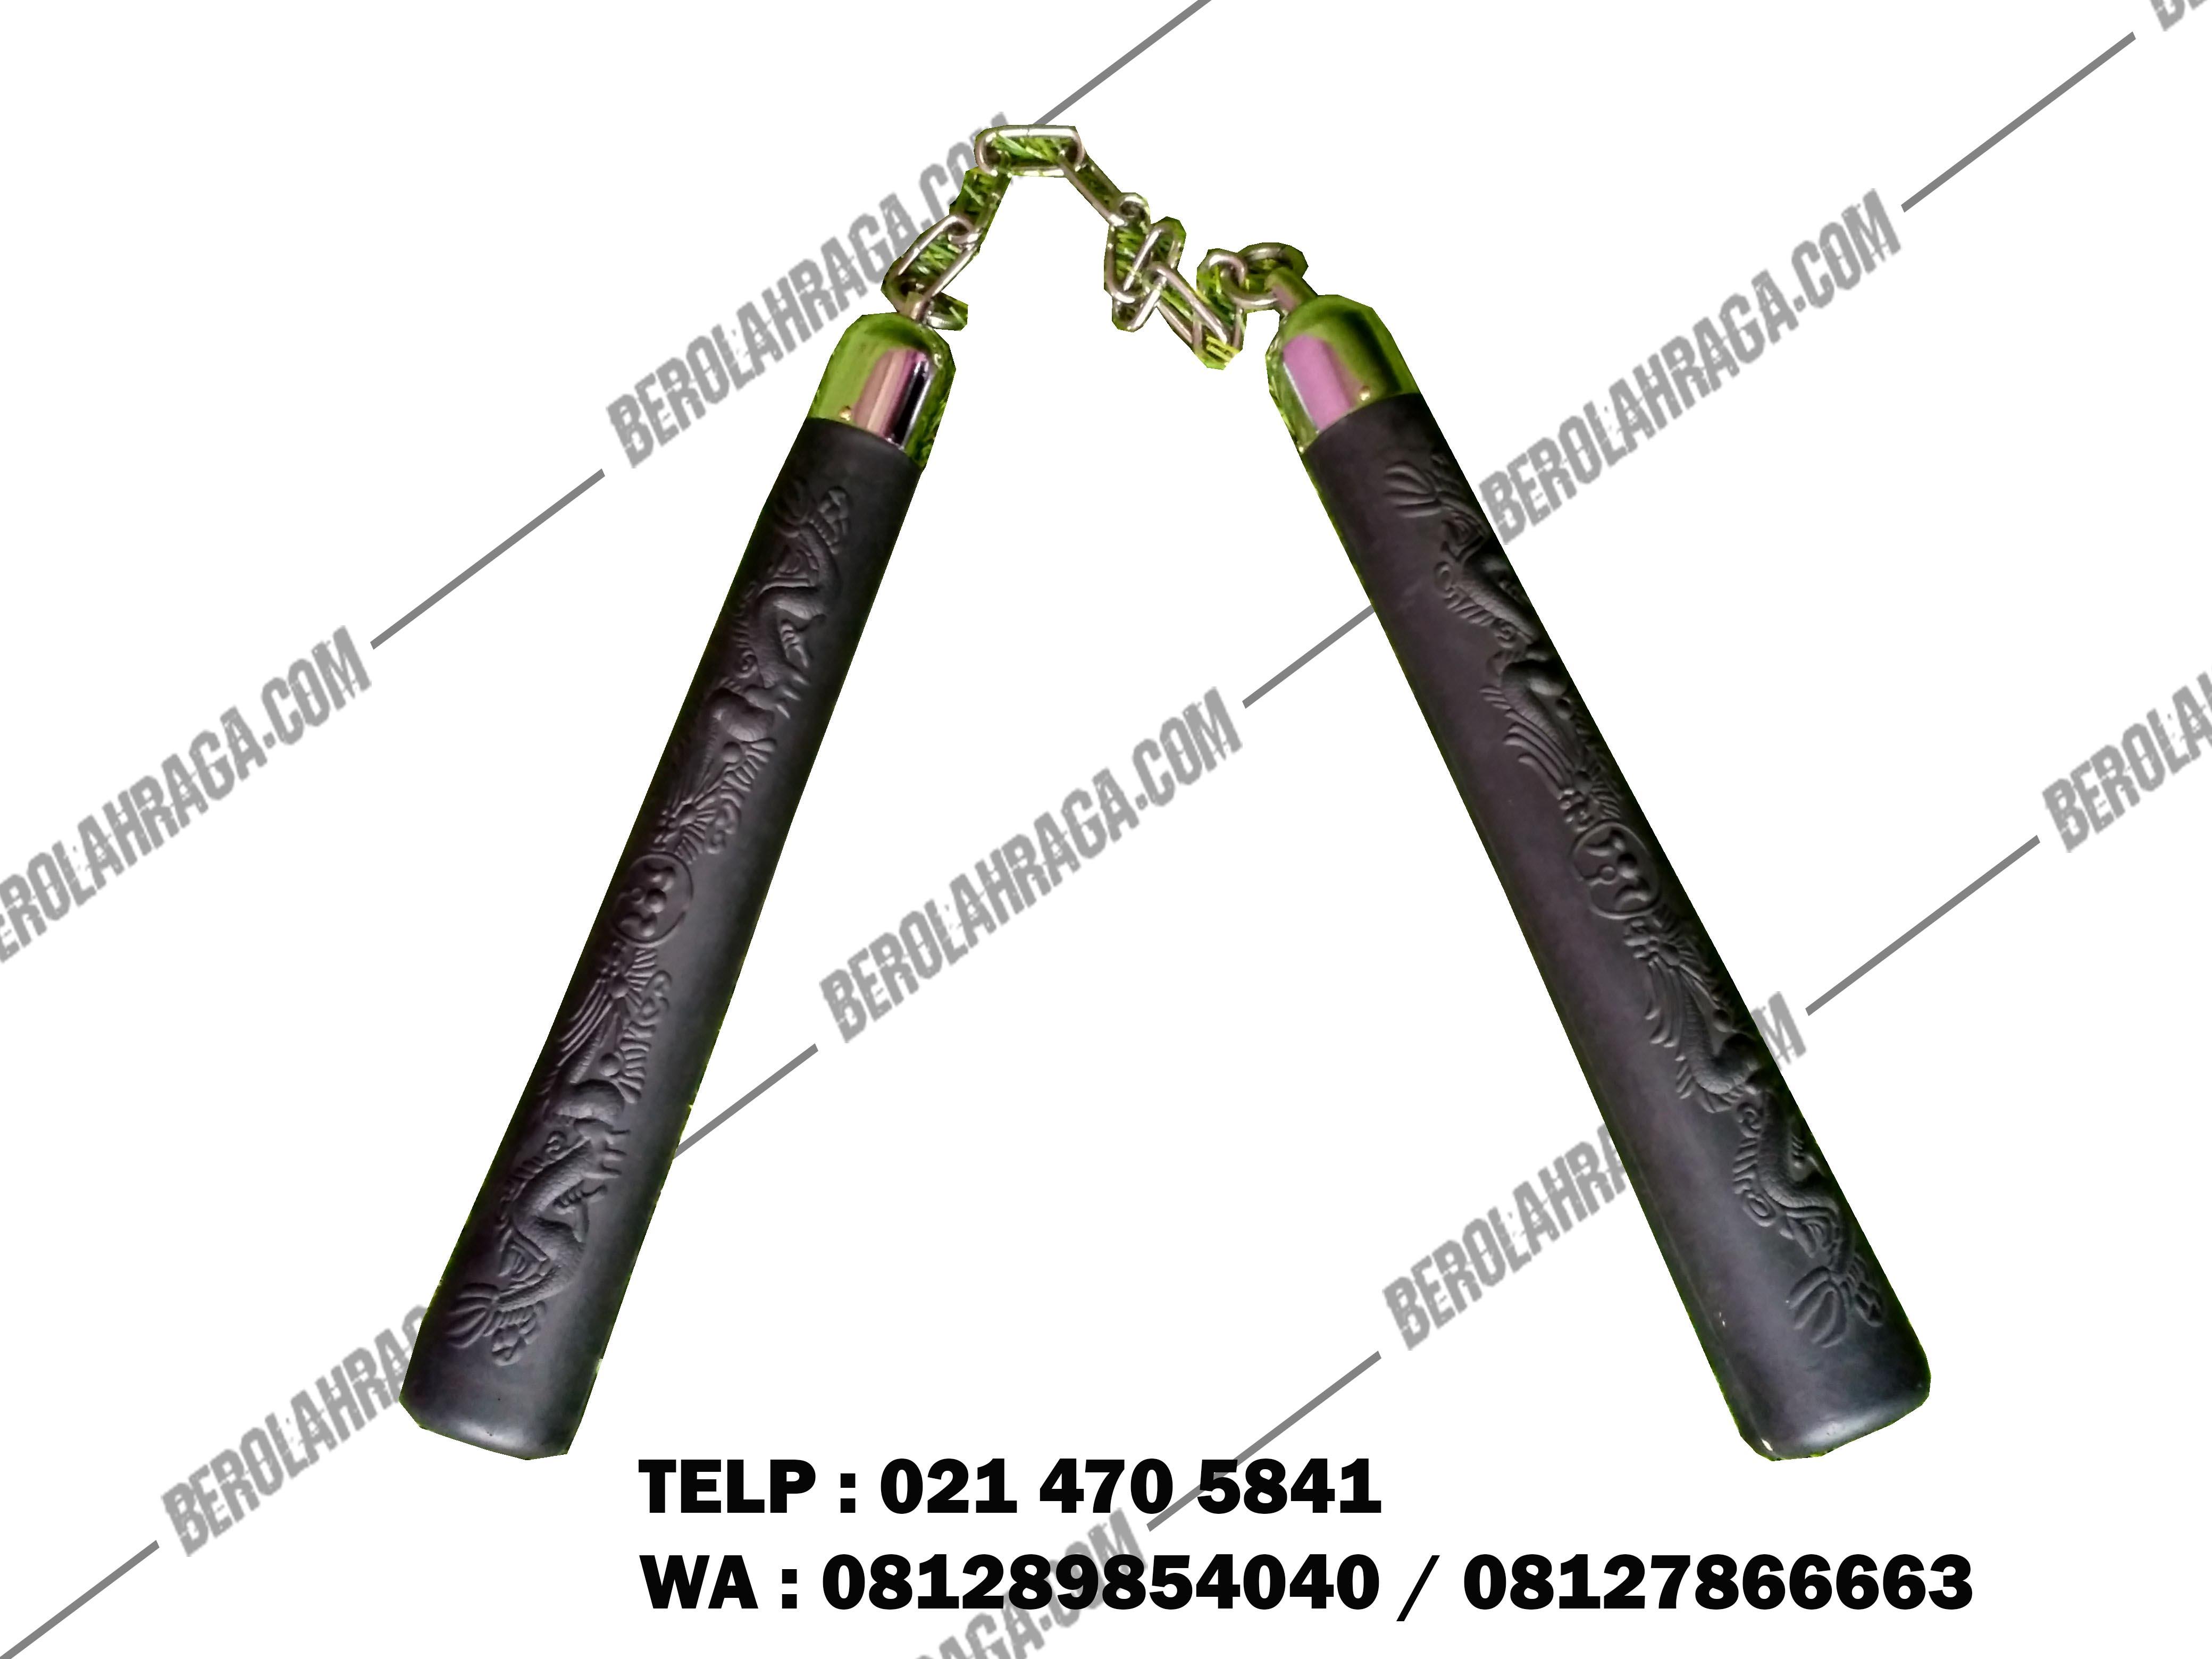 Double stick